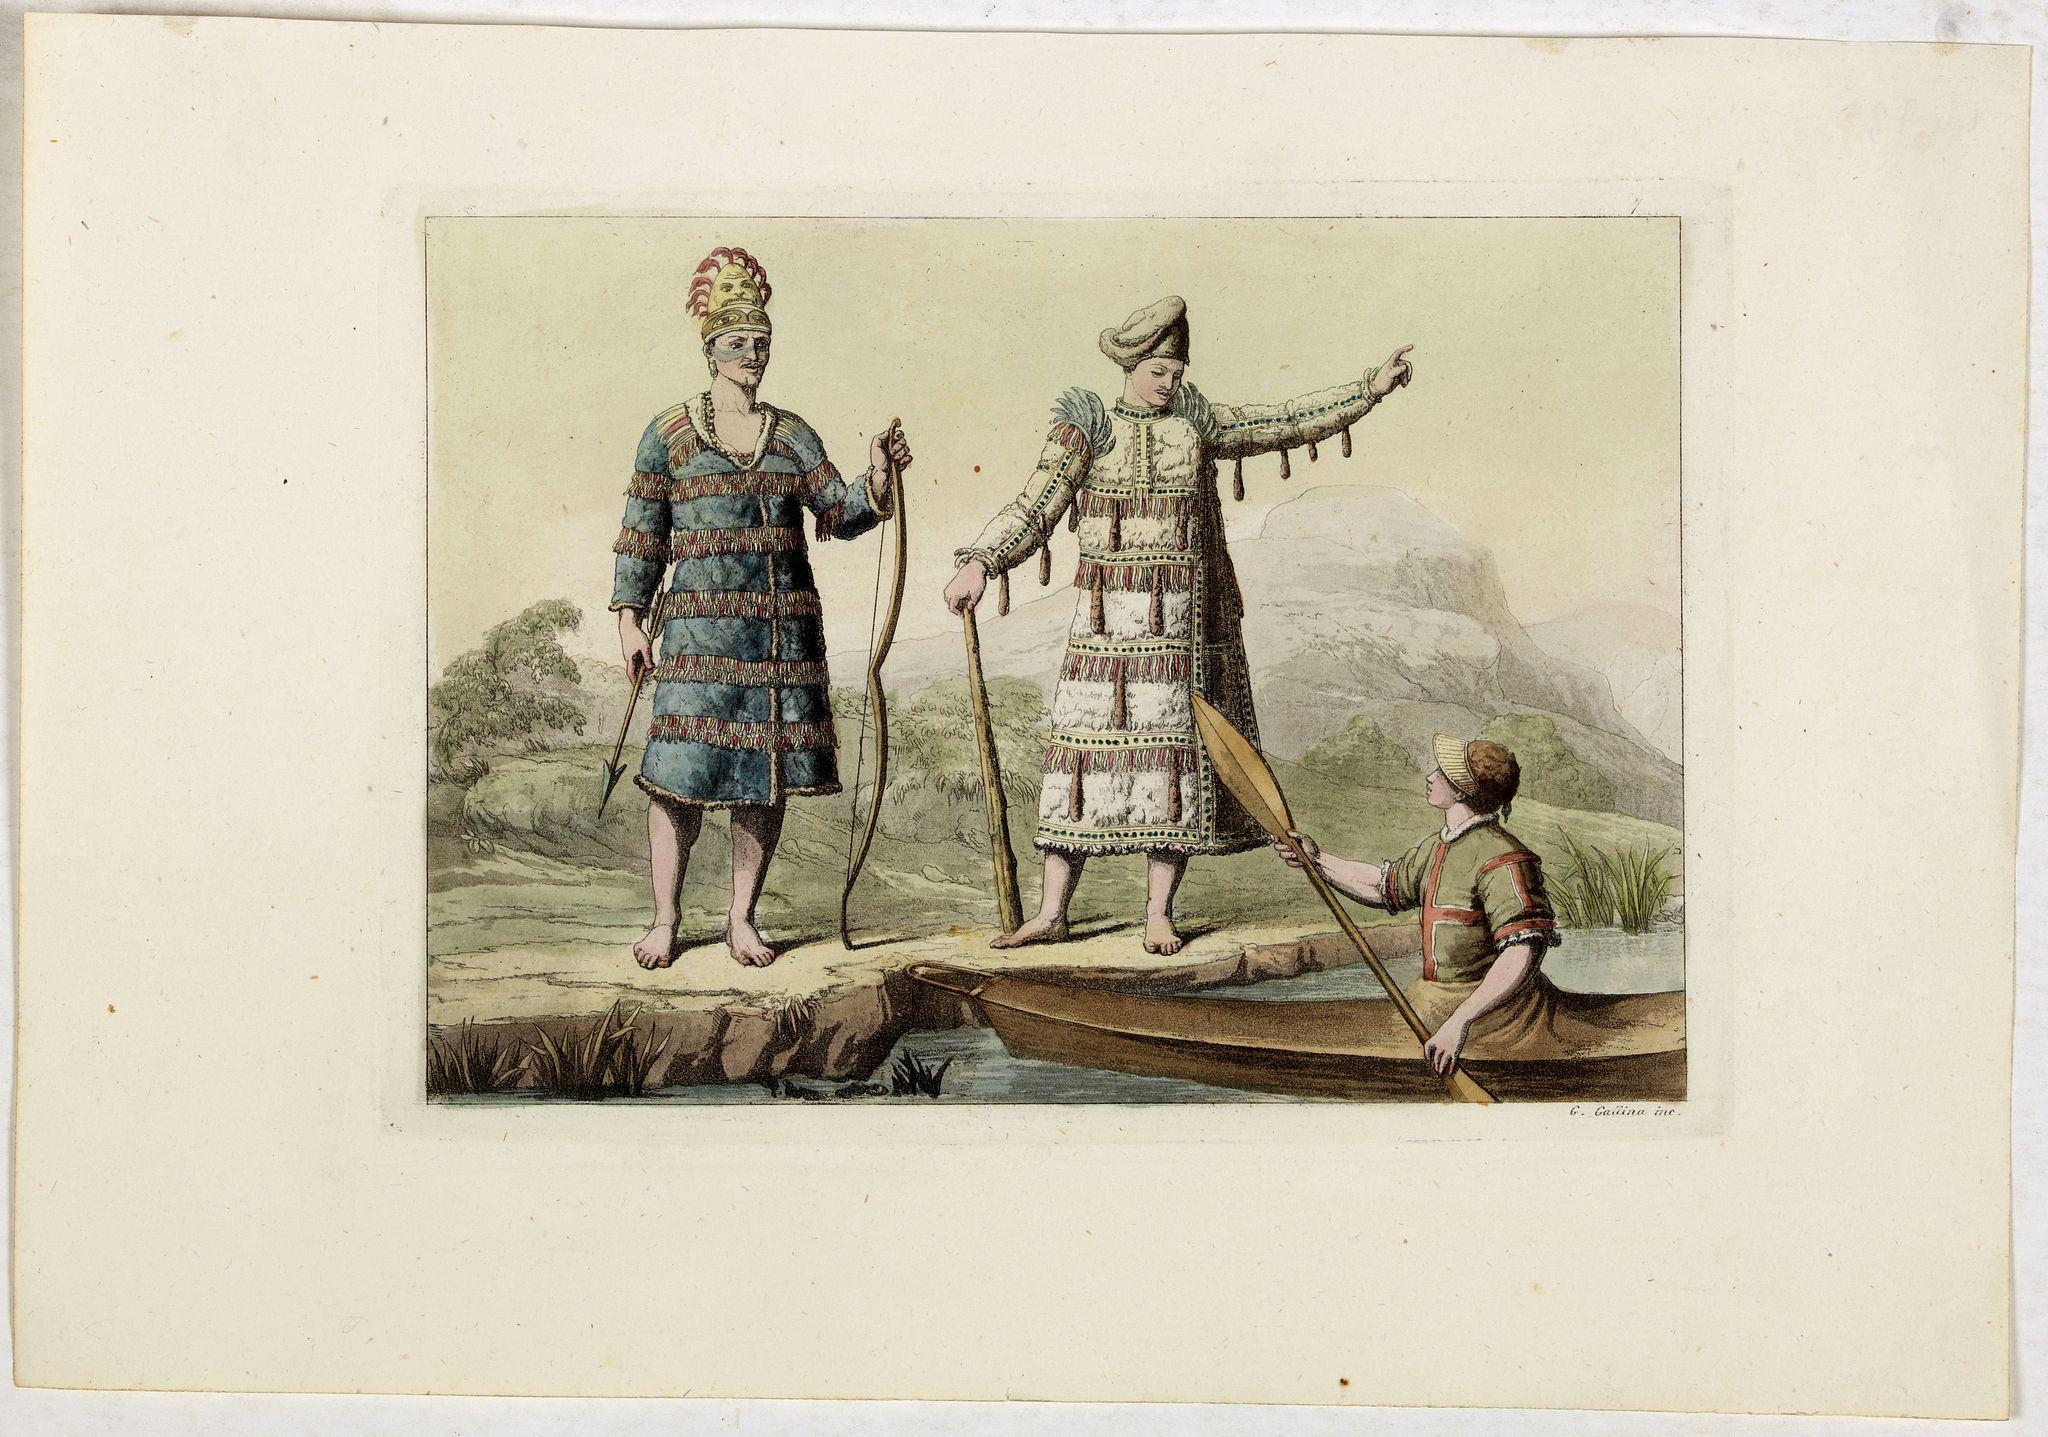 FERRARIO, G. -  [No title]. [three Alaska-North American Indians].